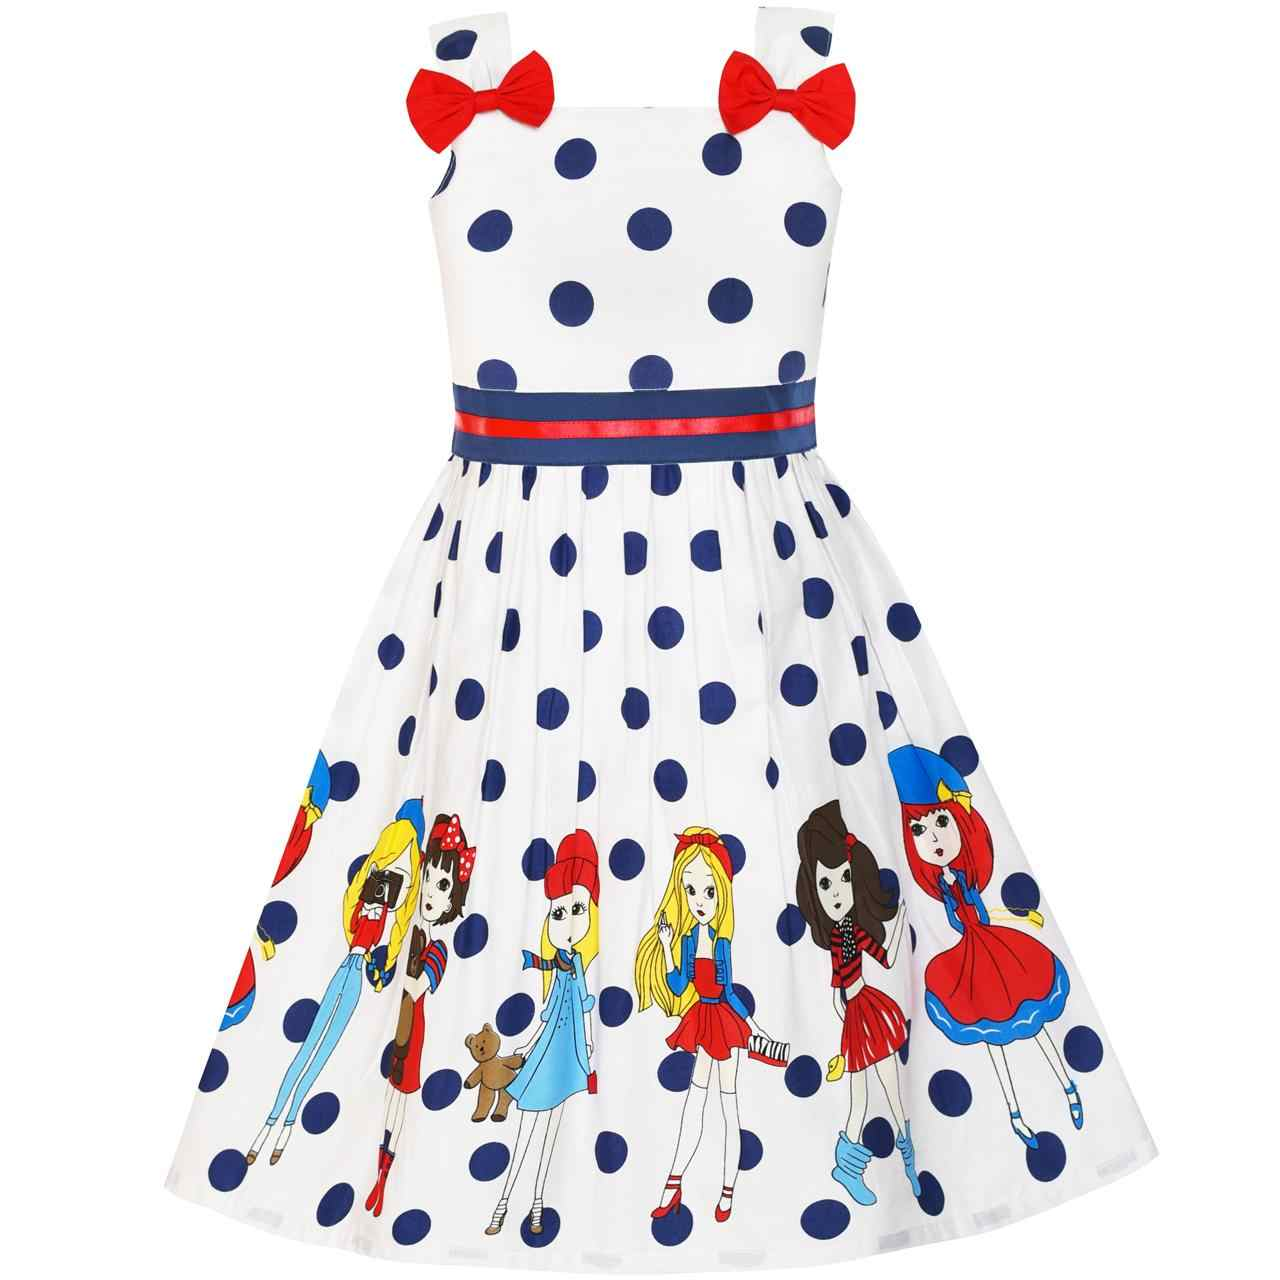 Sunny Fashion Vestido Menina Desenho animado Ponto Gravata-borboleta verão Sundress